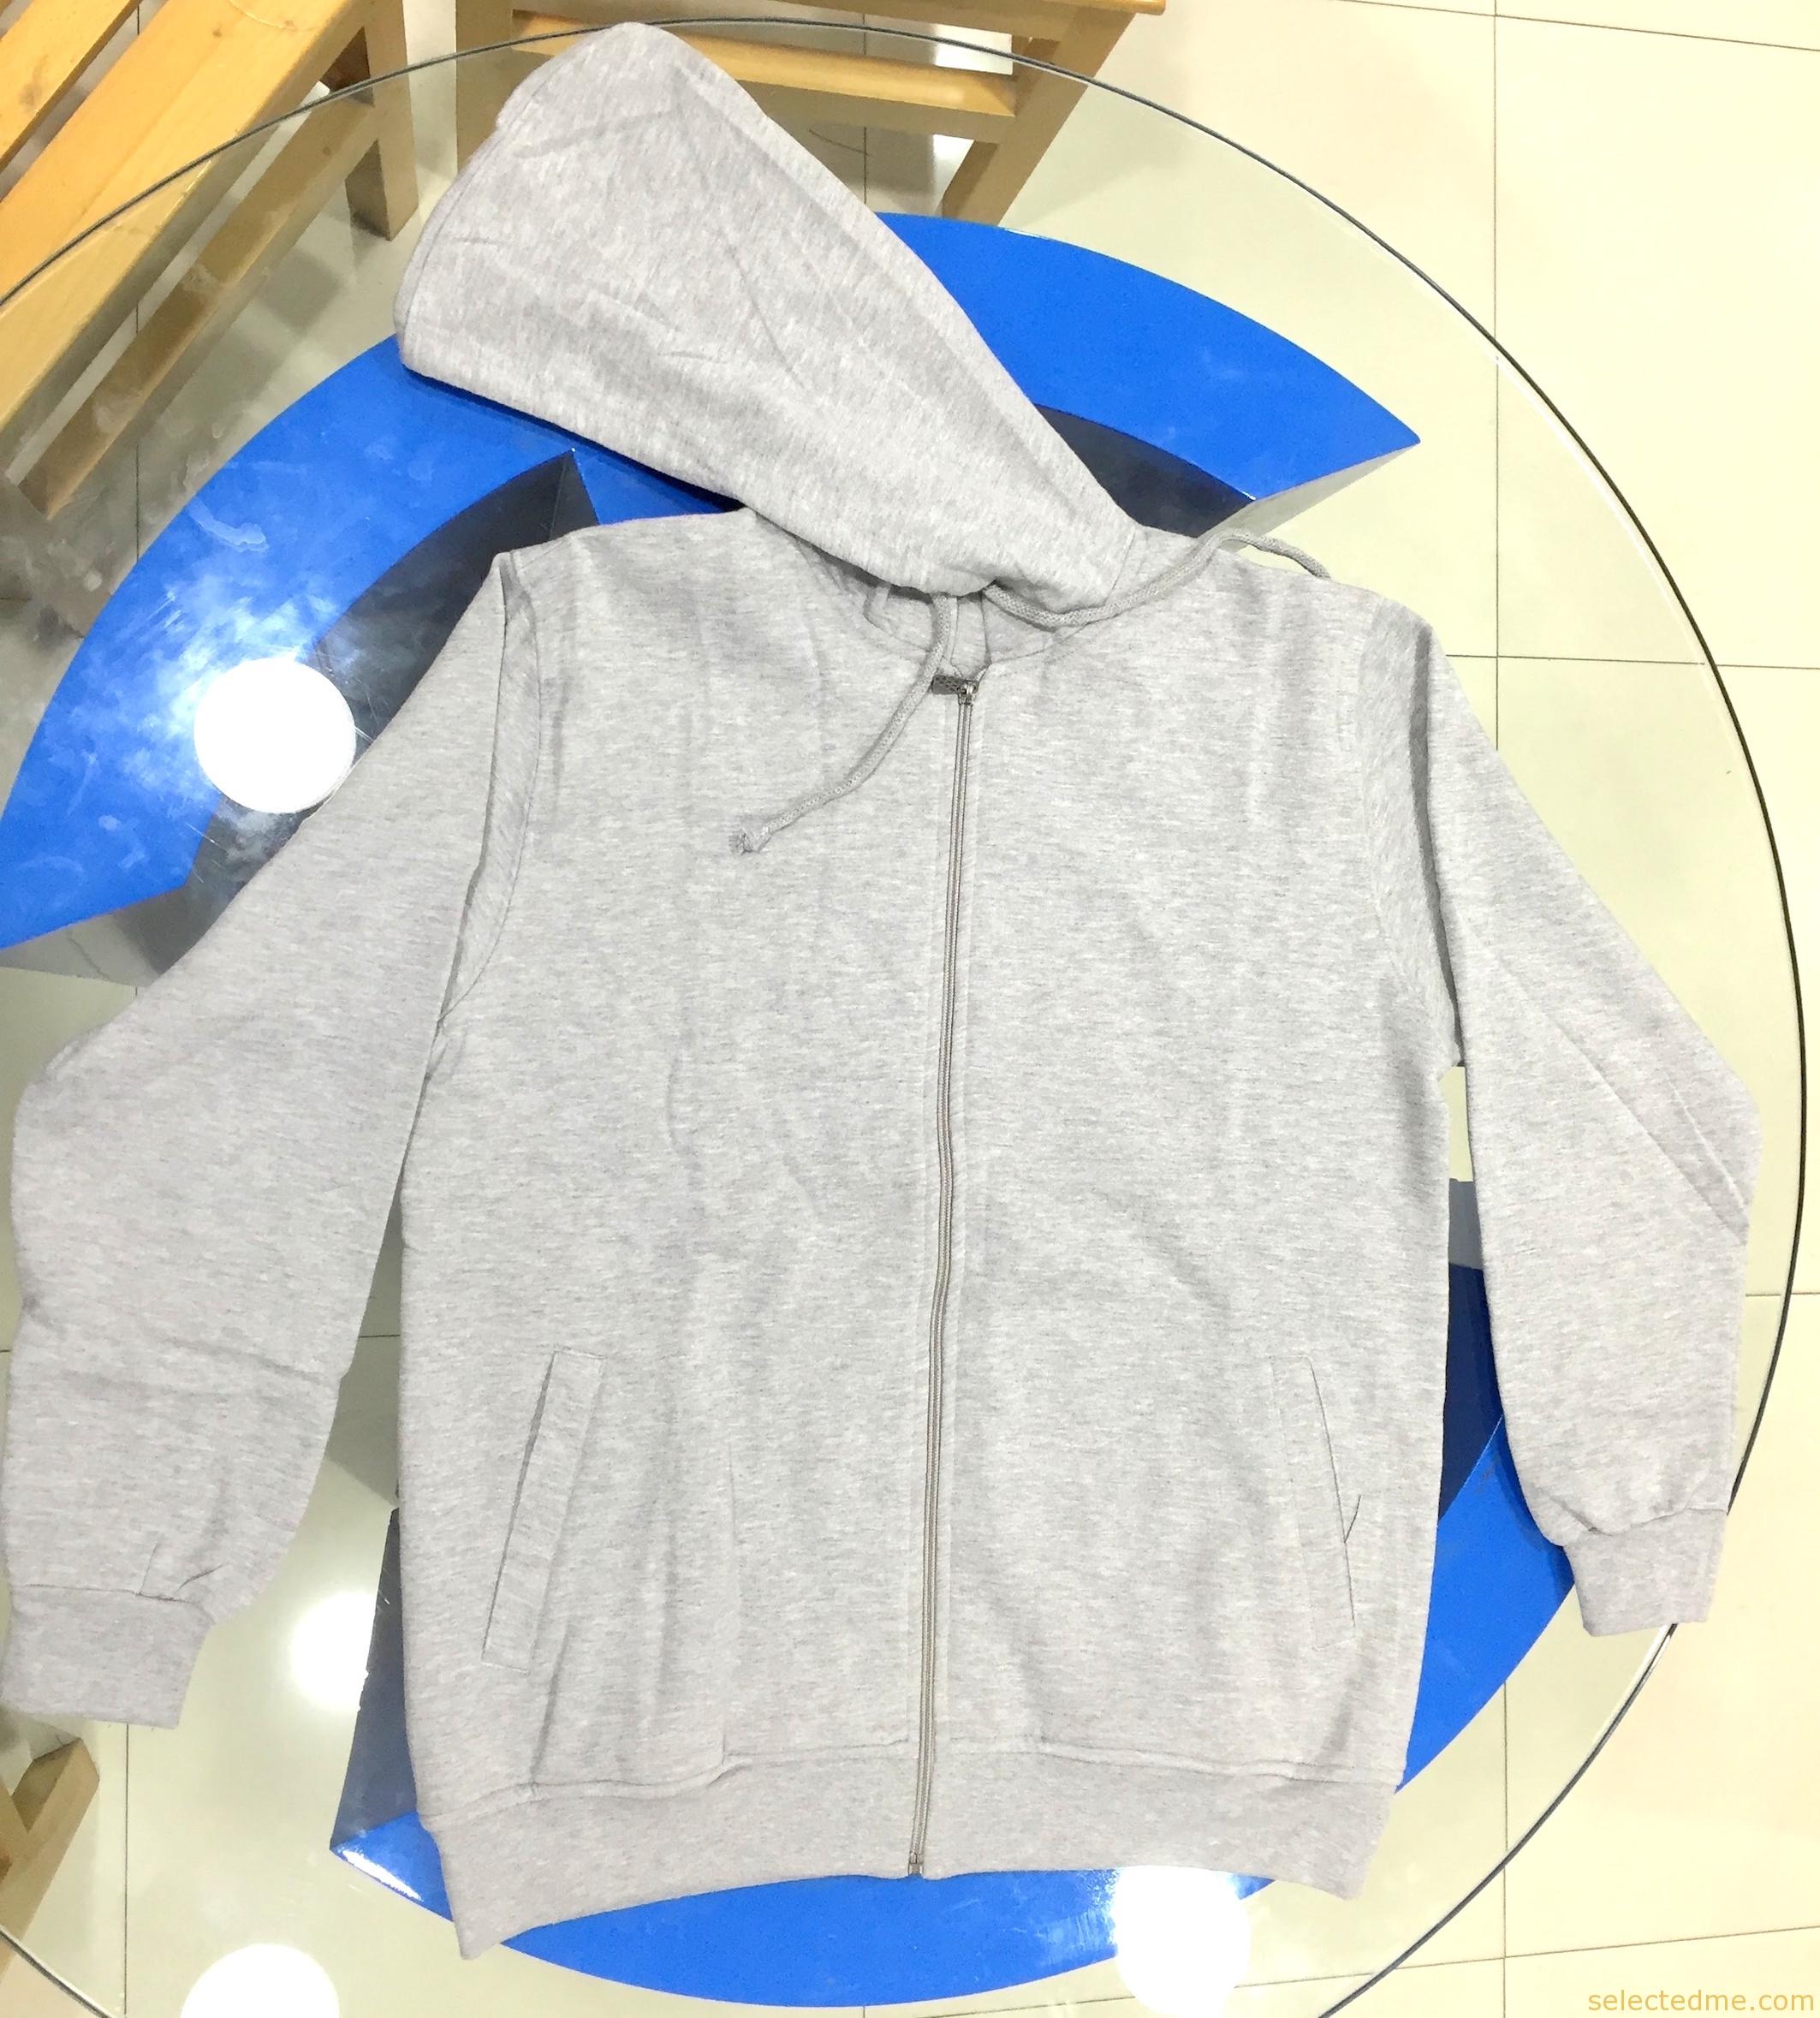 Sweatshirts & Hoodies winter wear fleece Jacket with printing Embrroidery in Dubai UAE for cheaper price